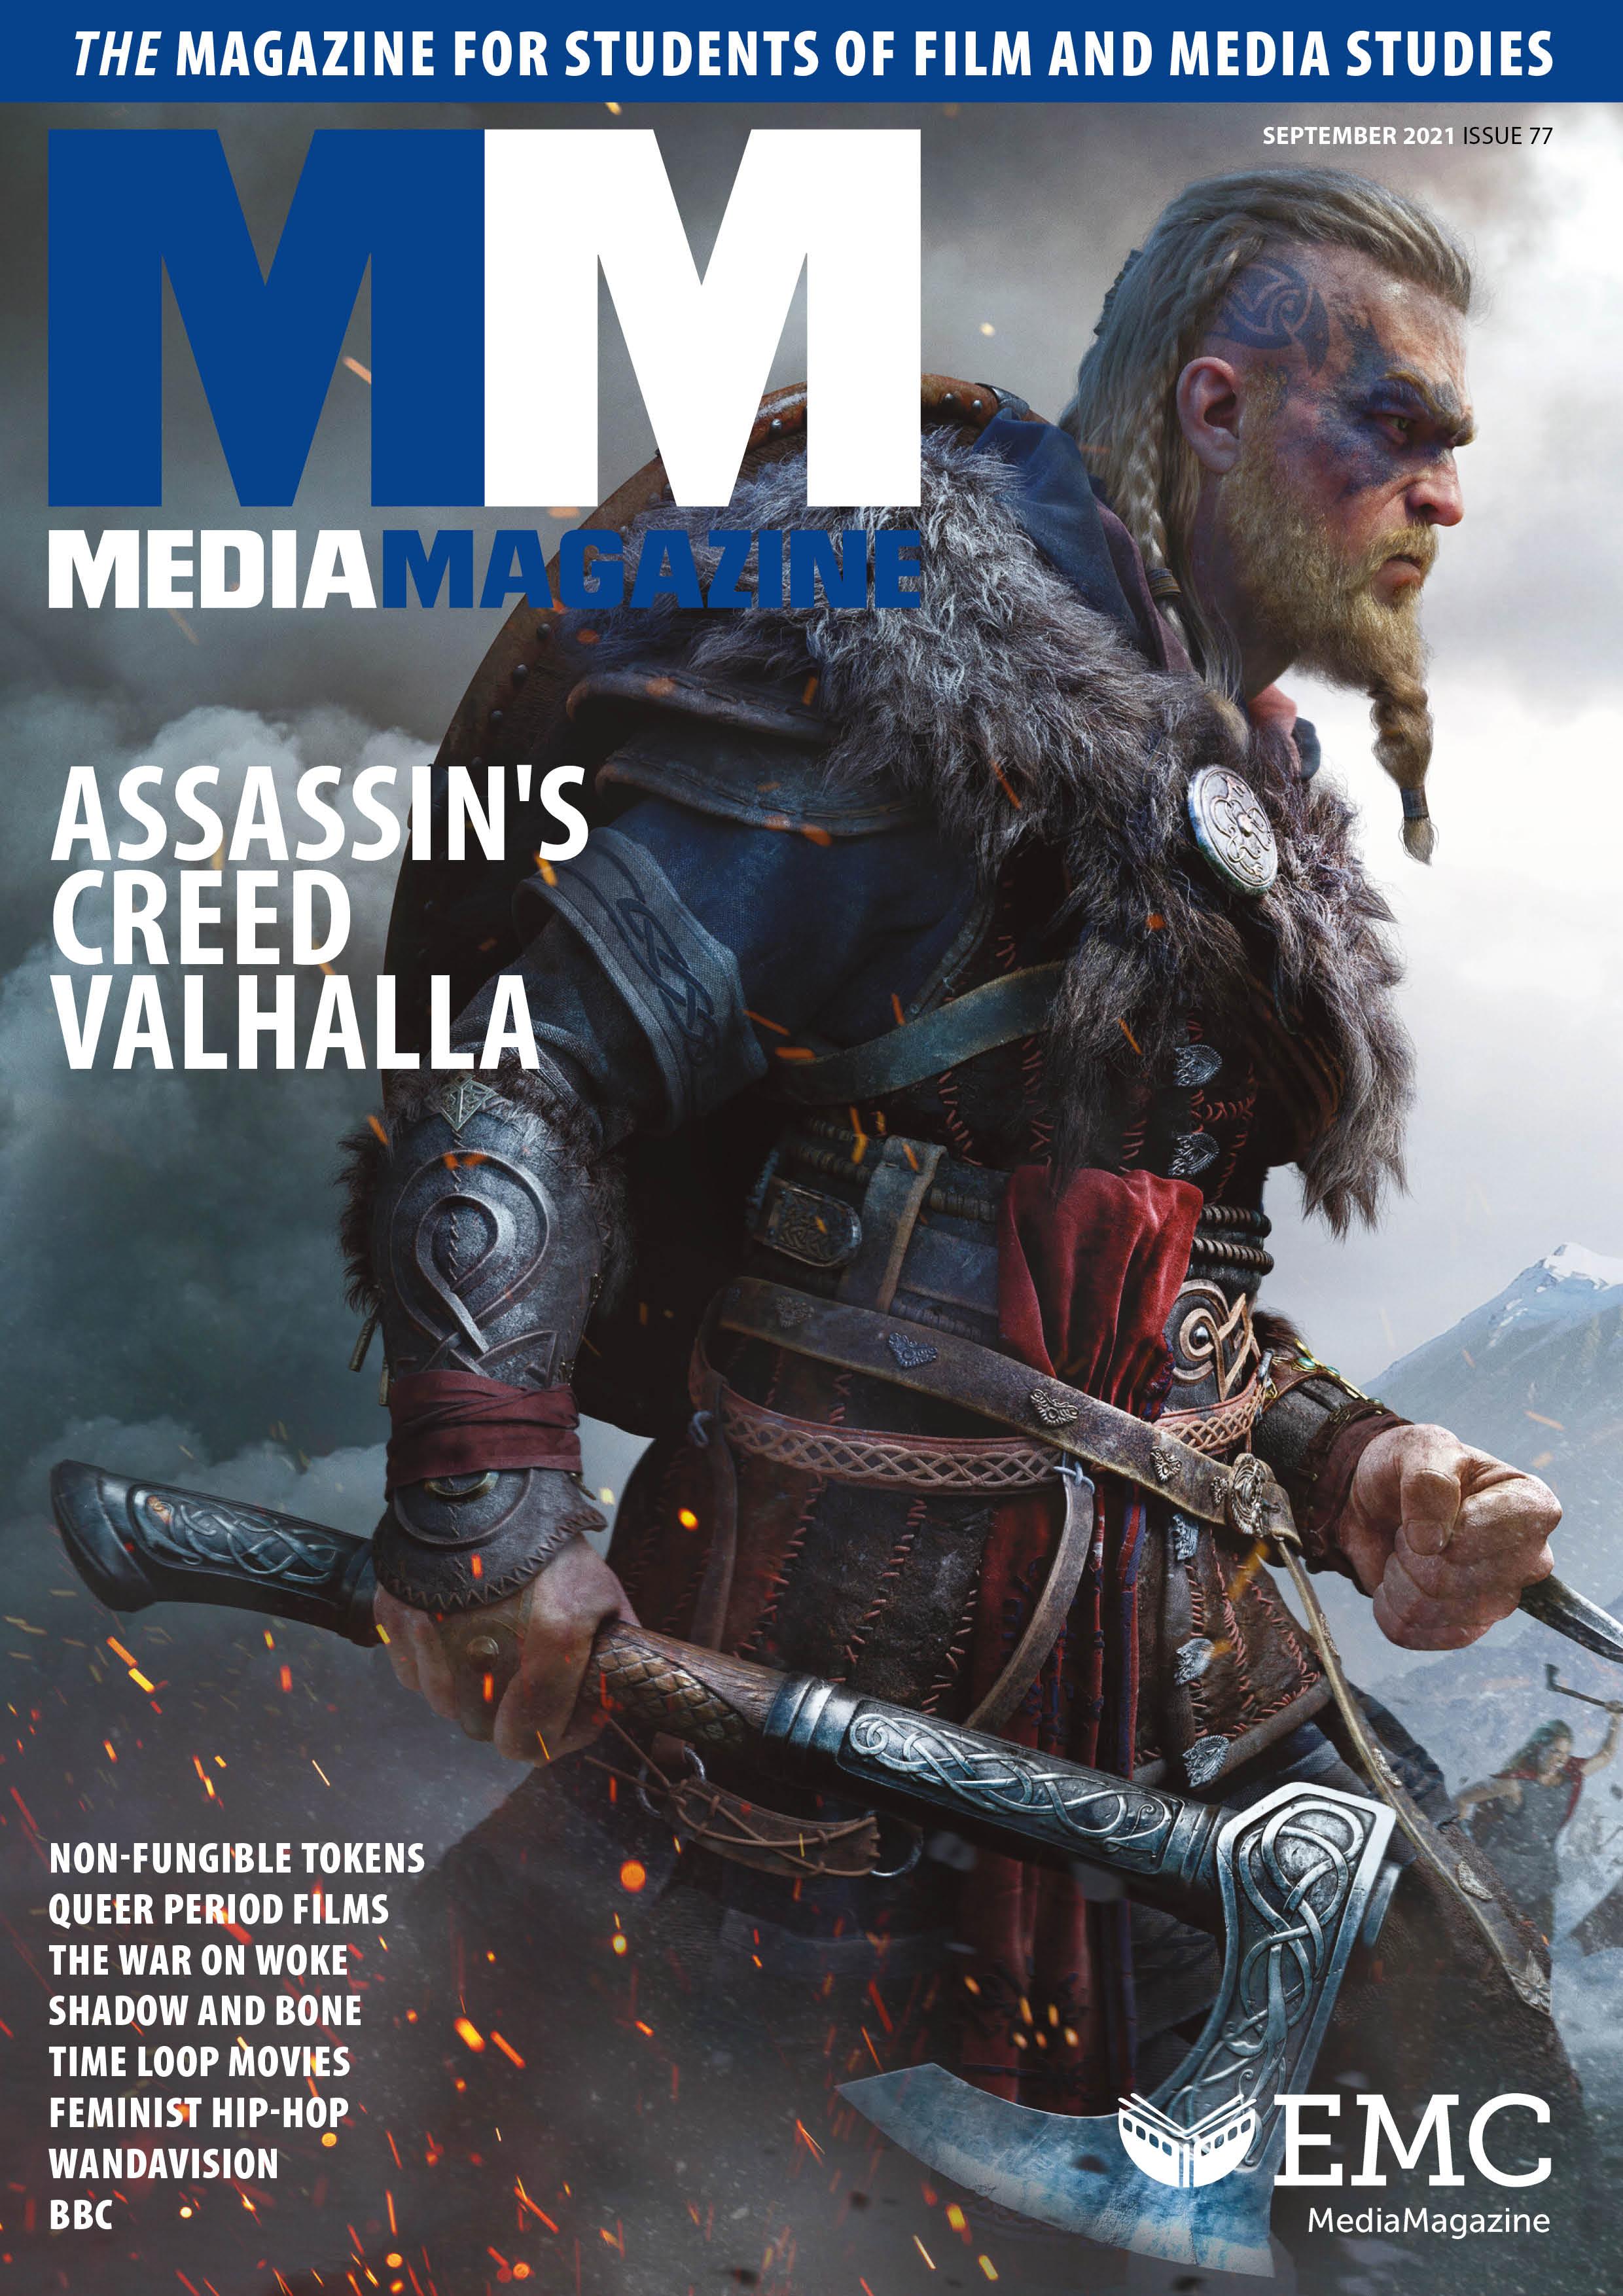 cover image for MediaMagazine